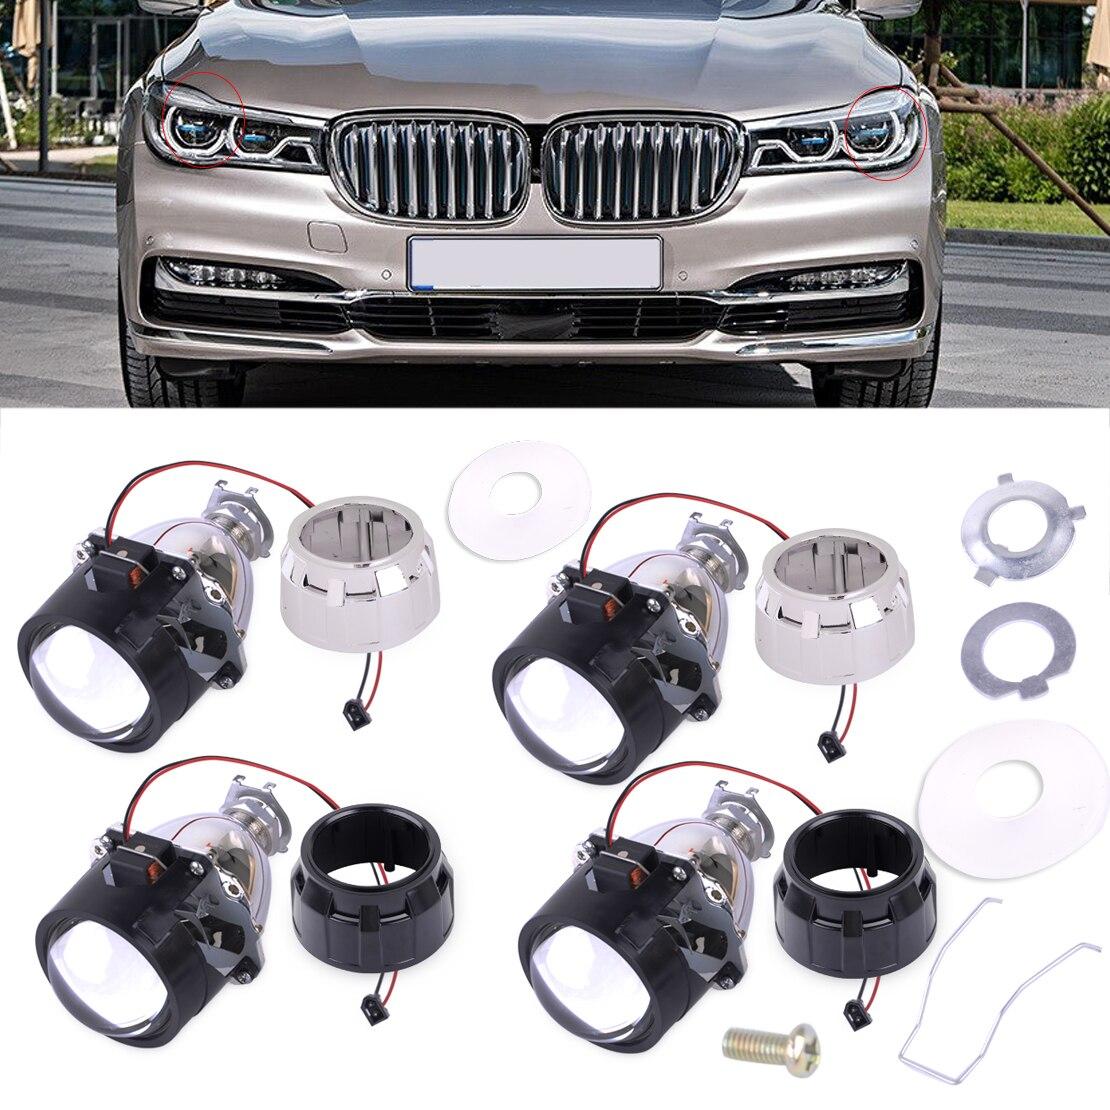 DWCX Car 2.5'' H1 Car Mini HID Low High Beams Bi-xenon Projector Halo Lens Kit + Headlight Shroud for All Models with H1 Socket